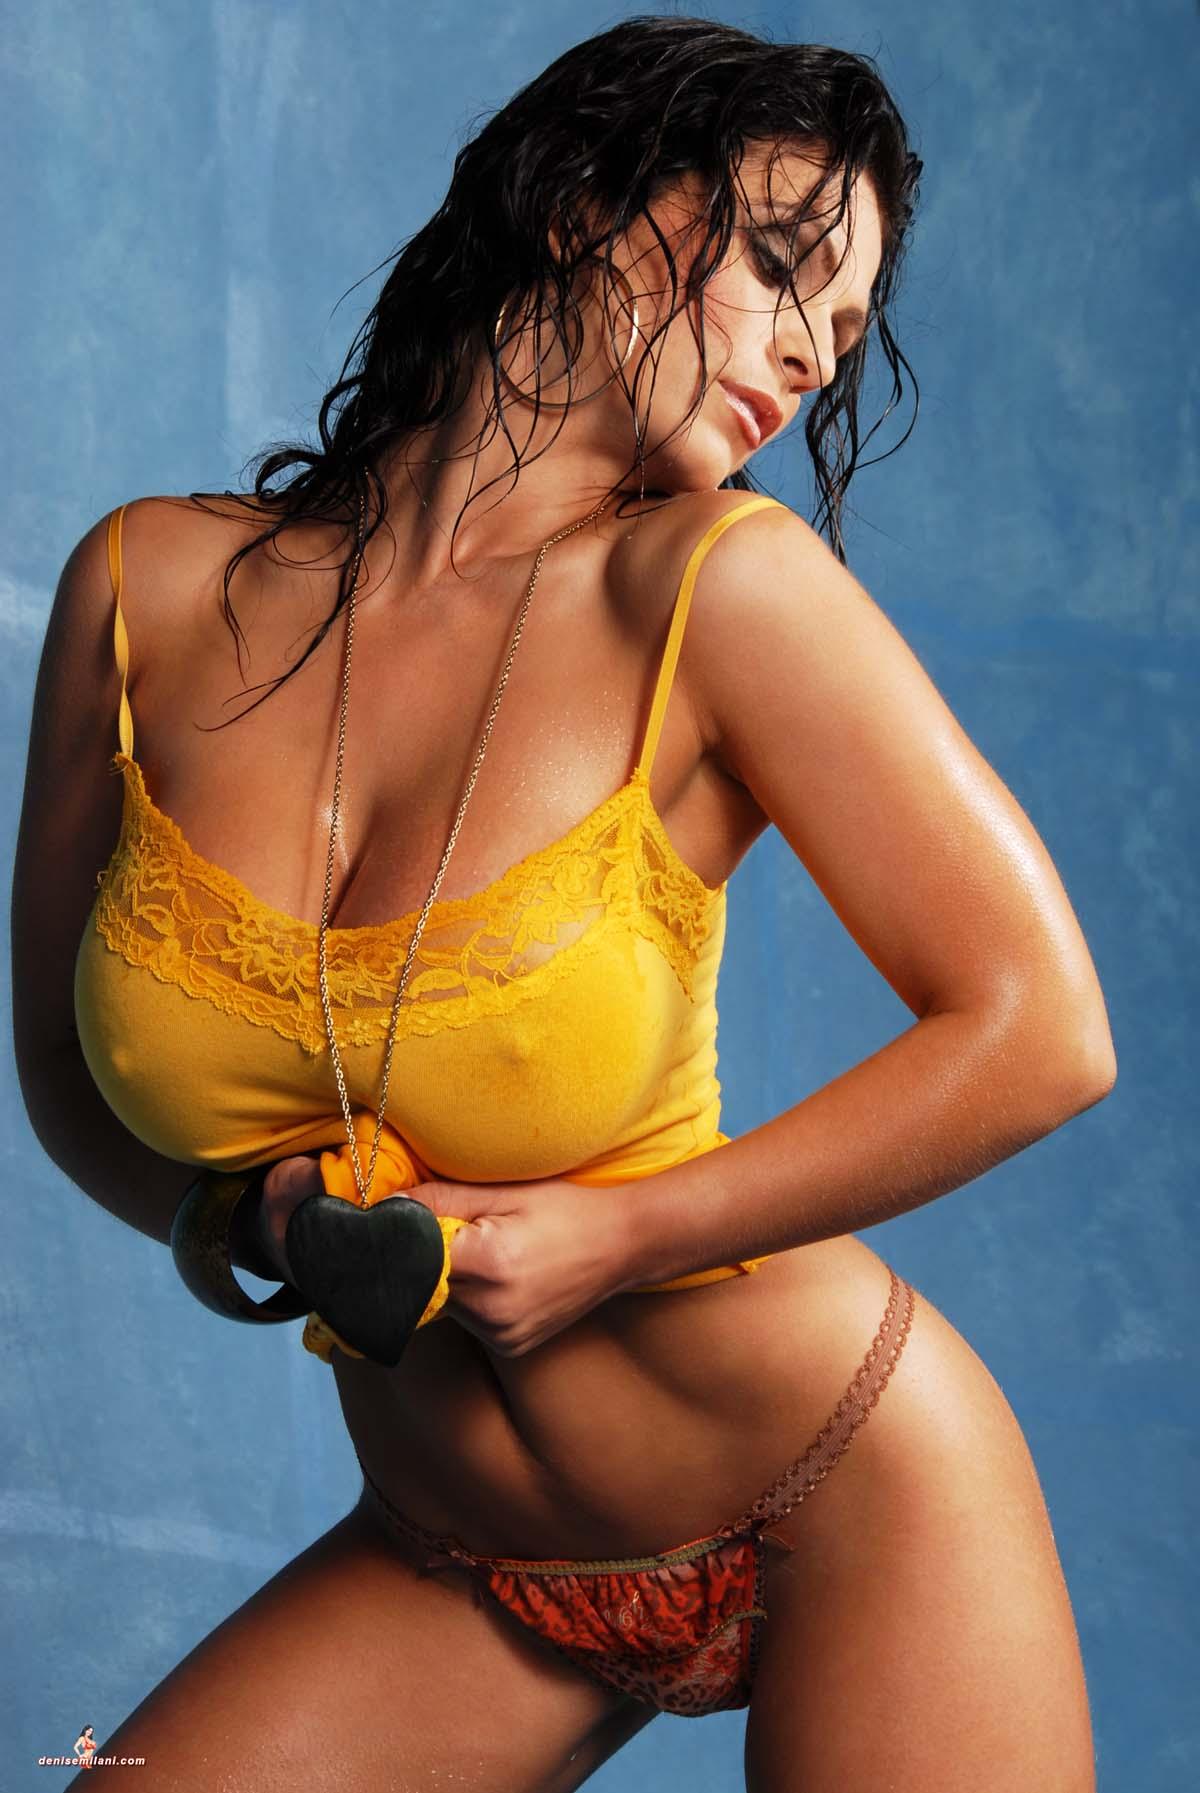 Denise milani shows boobs